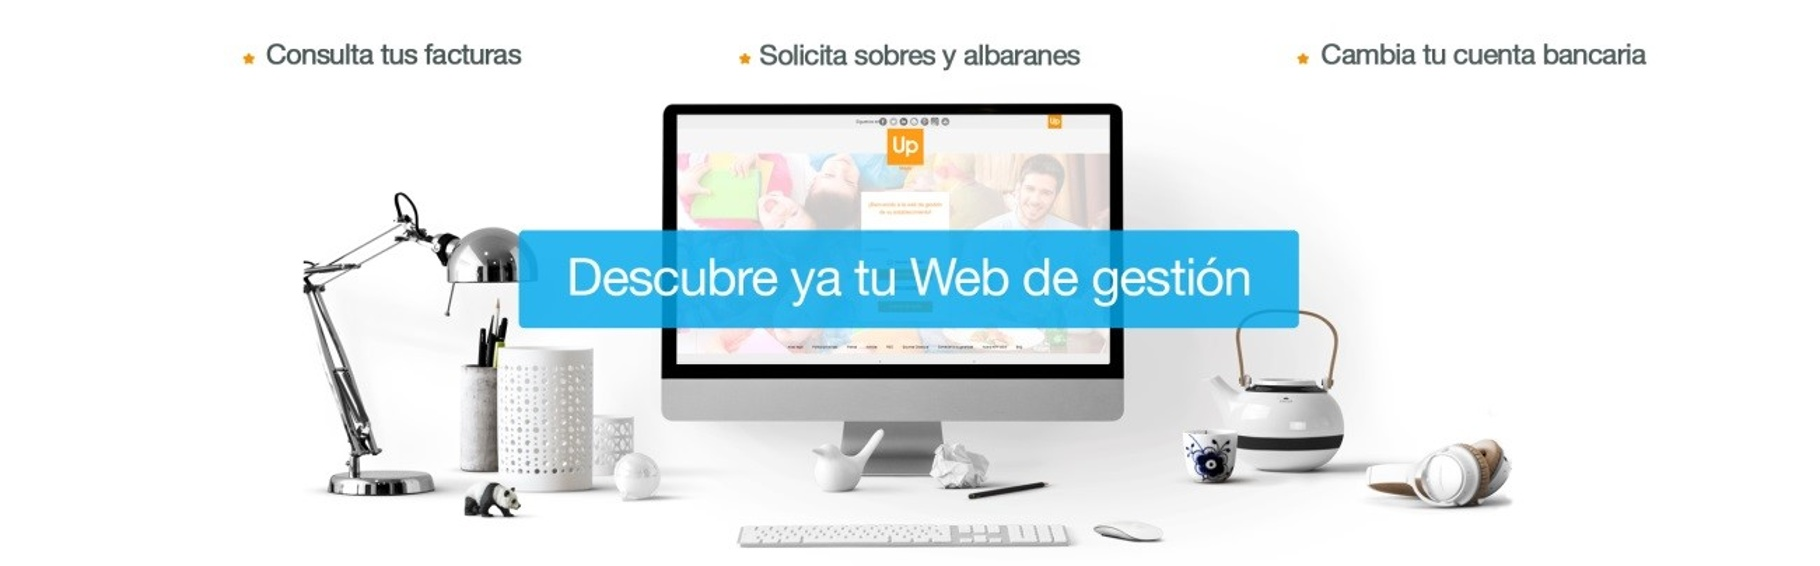 Web de afiliados